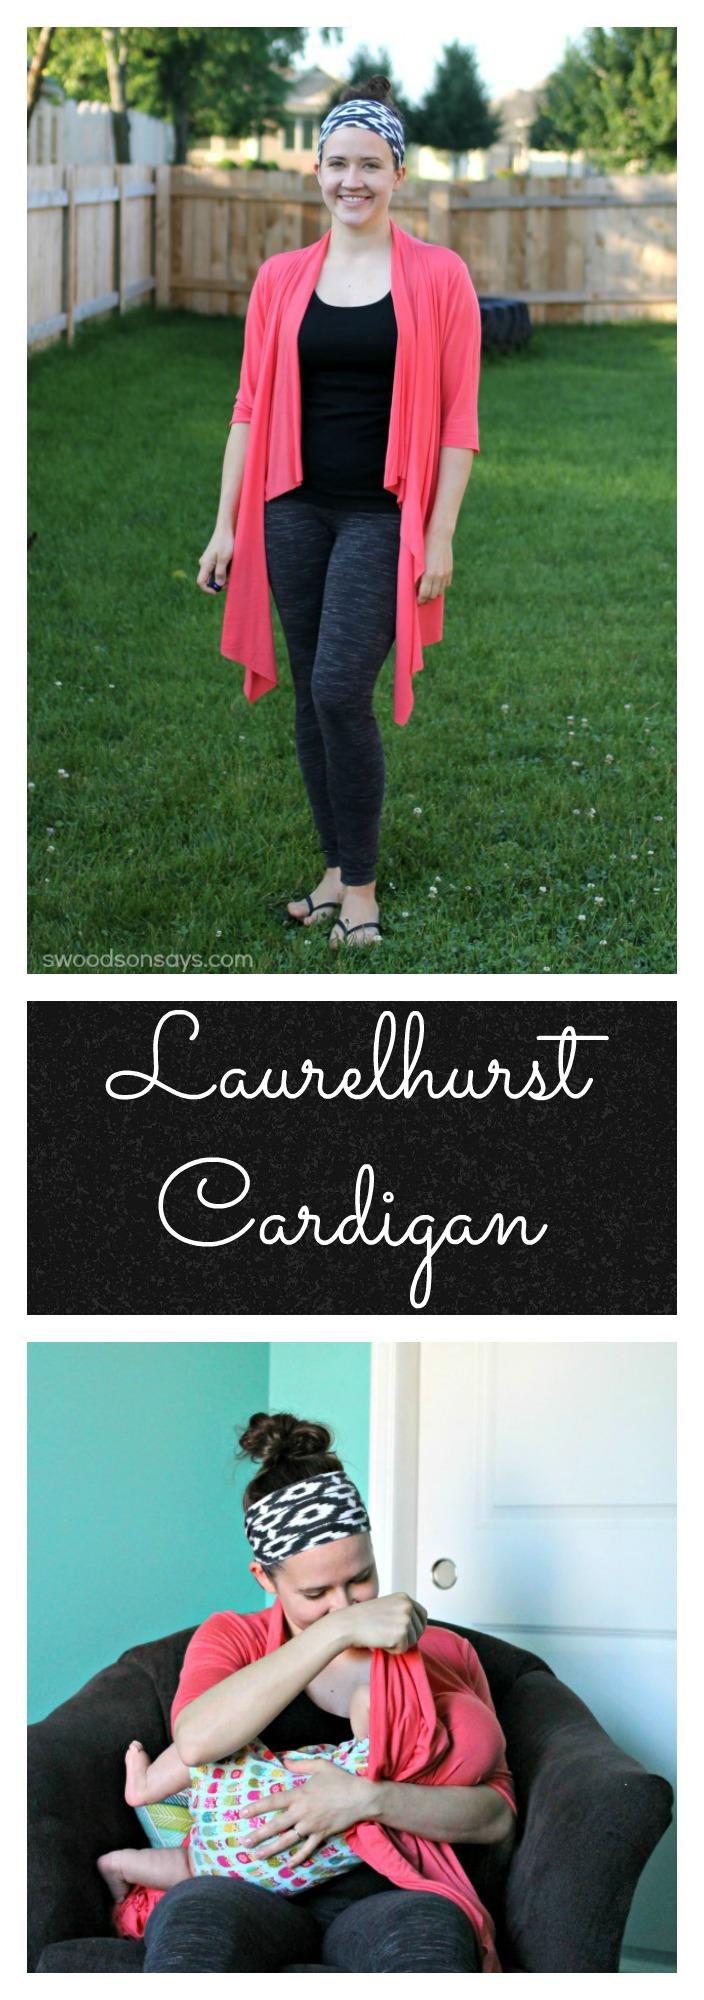 Laurelhurst Cardigan Straight Stitch Designs